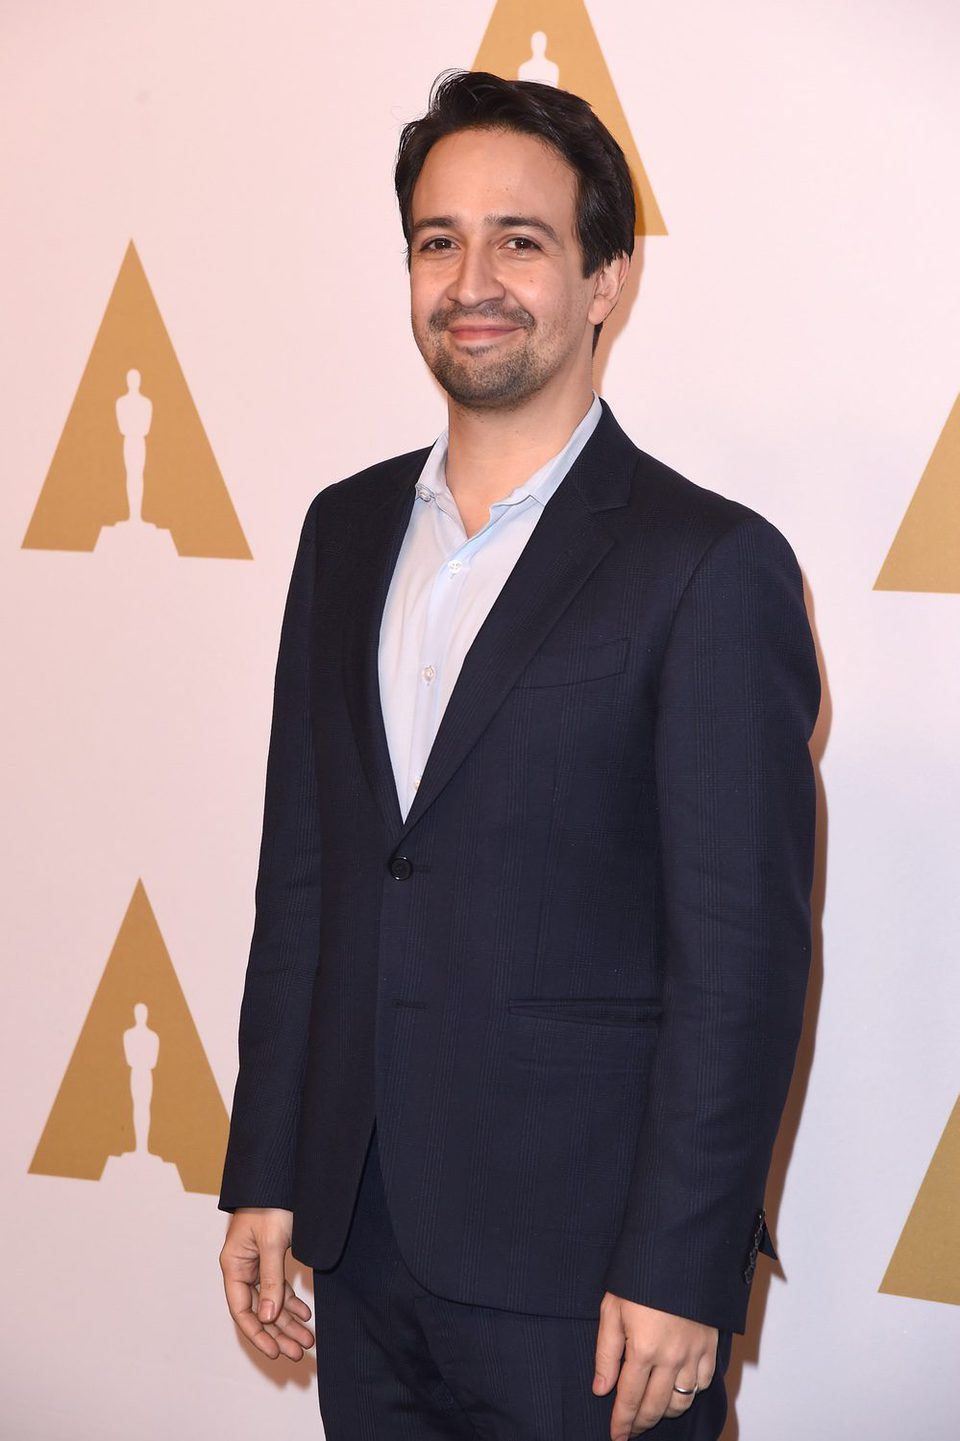 Lin-Manuel Miranda at the 2017 Annual Academy Awards Nominee Luncheon